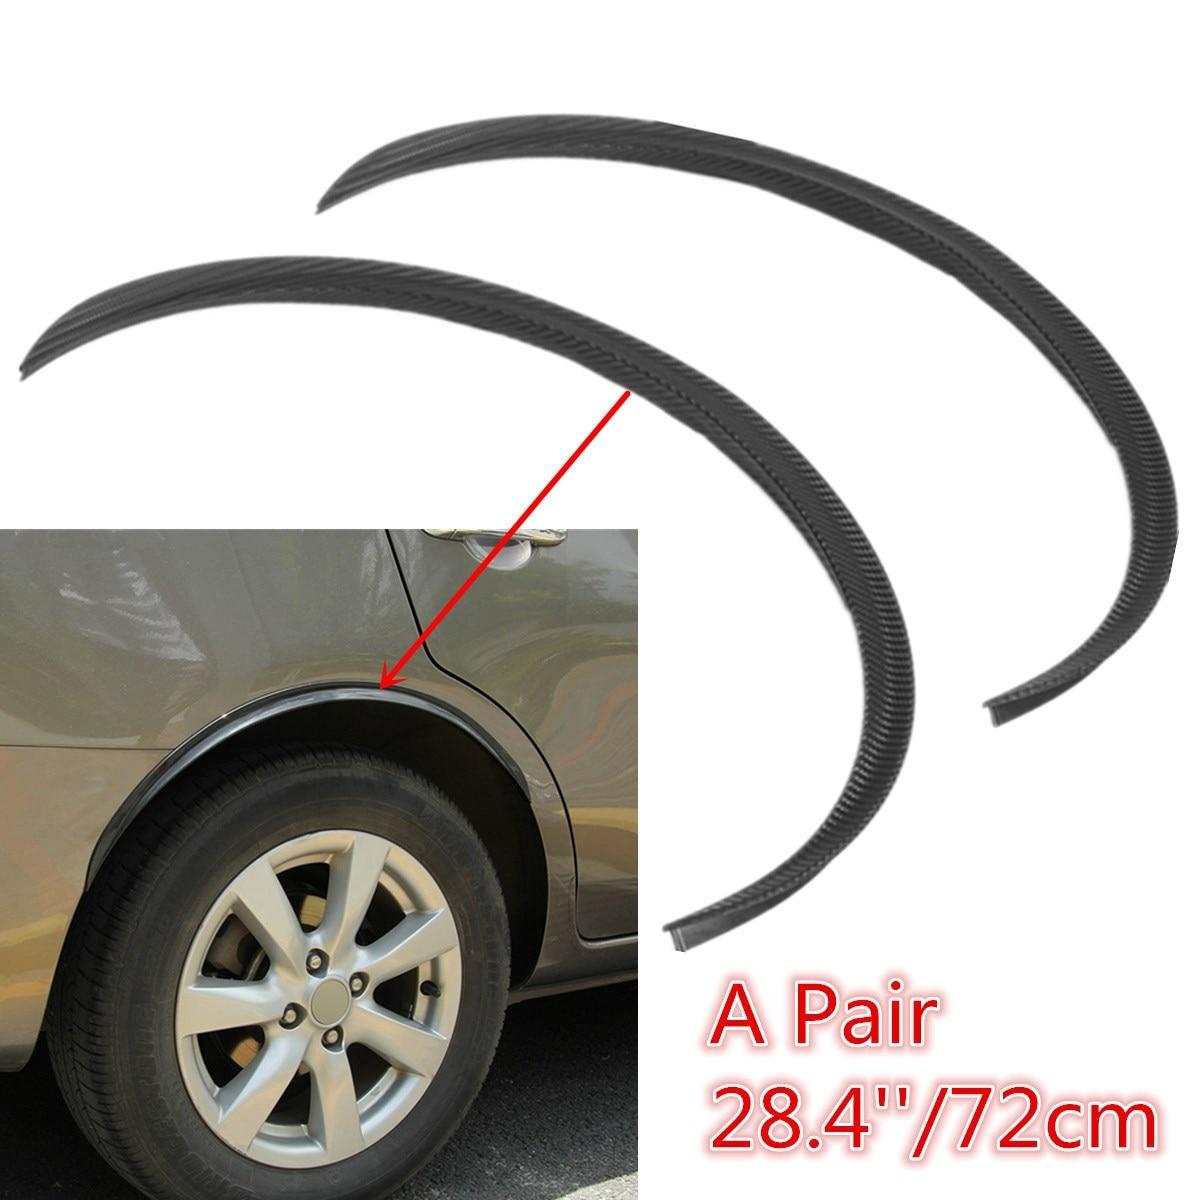 2Pcs/pair Universal Black Car Carbon Fiber Large Round Arc Strip Protector Wheel Eyebrow Decal Sticker For Fender